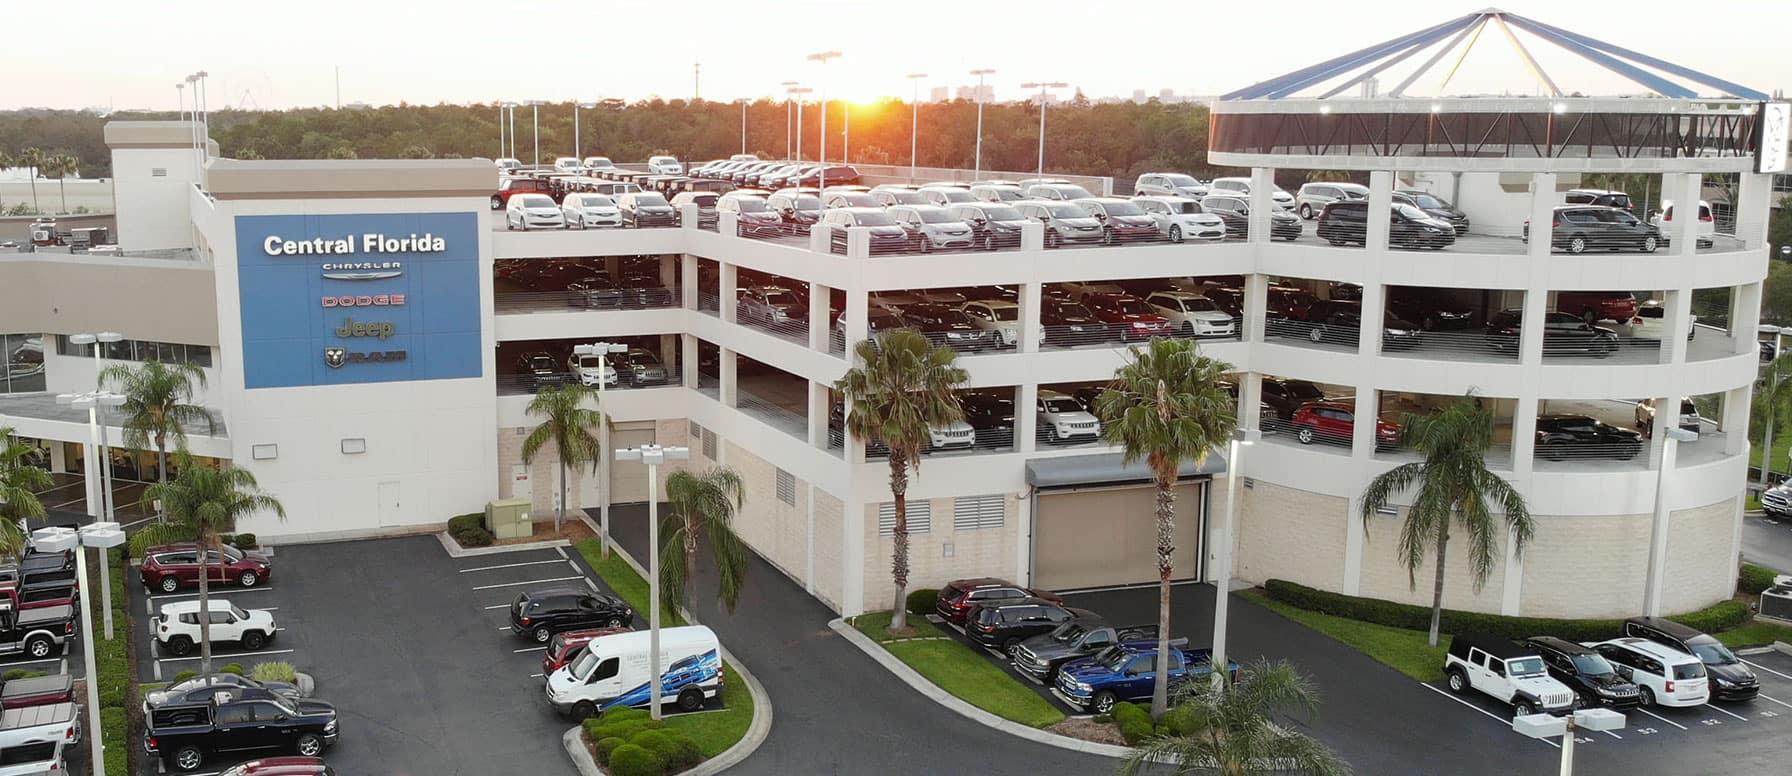 dodge dealership orlando Central Florida Chrysler Dodge Jeep Ram is Your Orlando Car